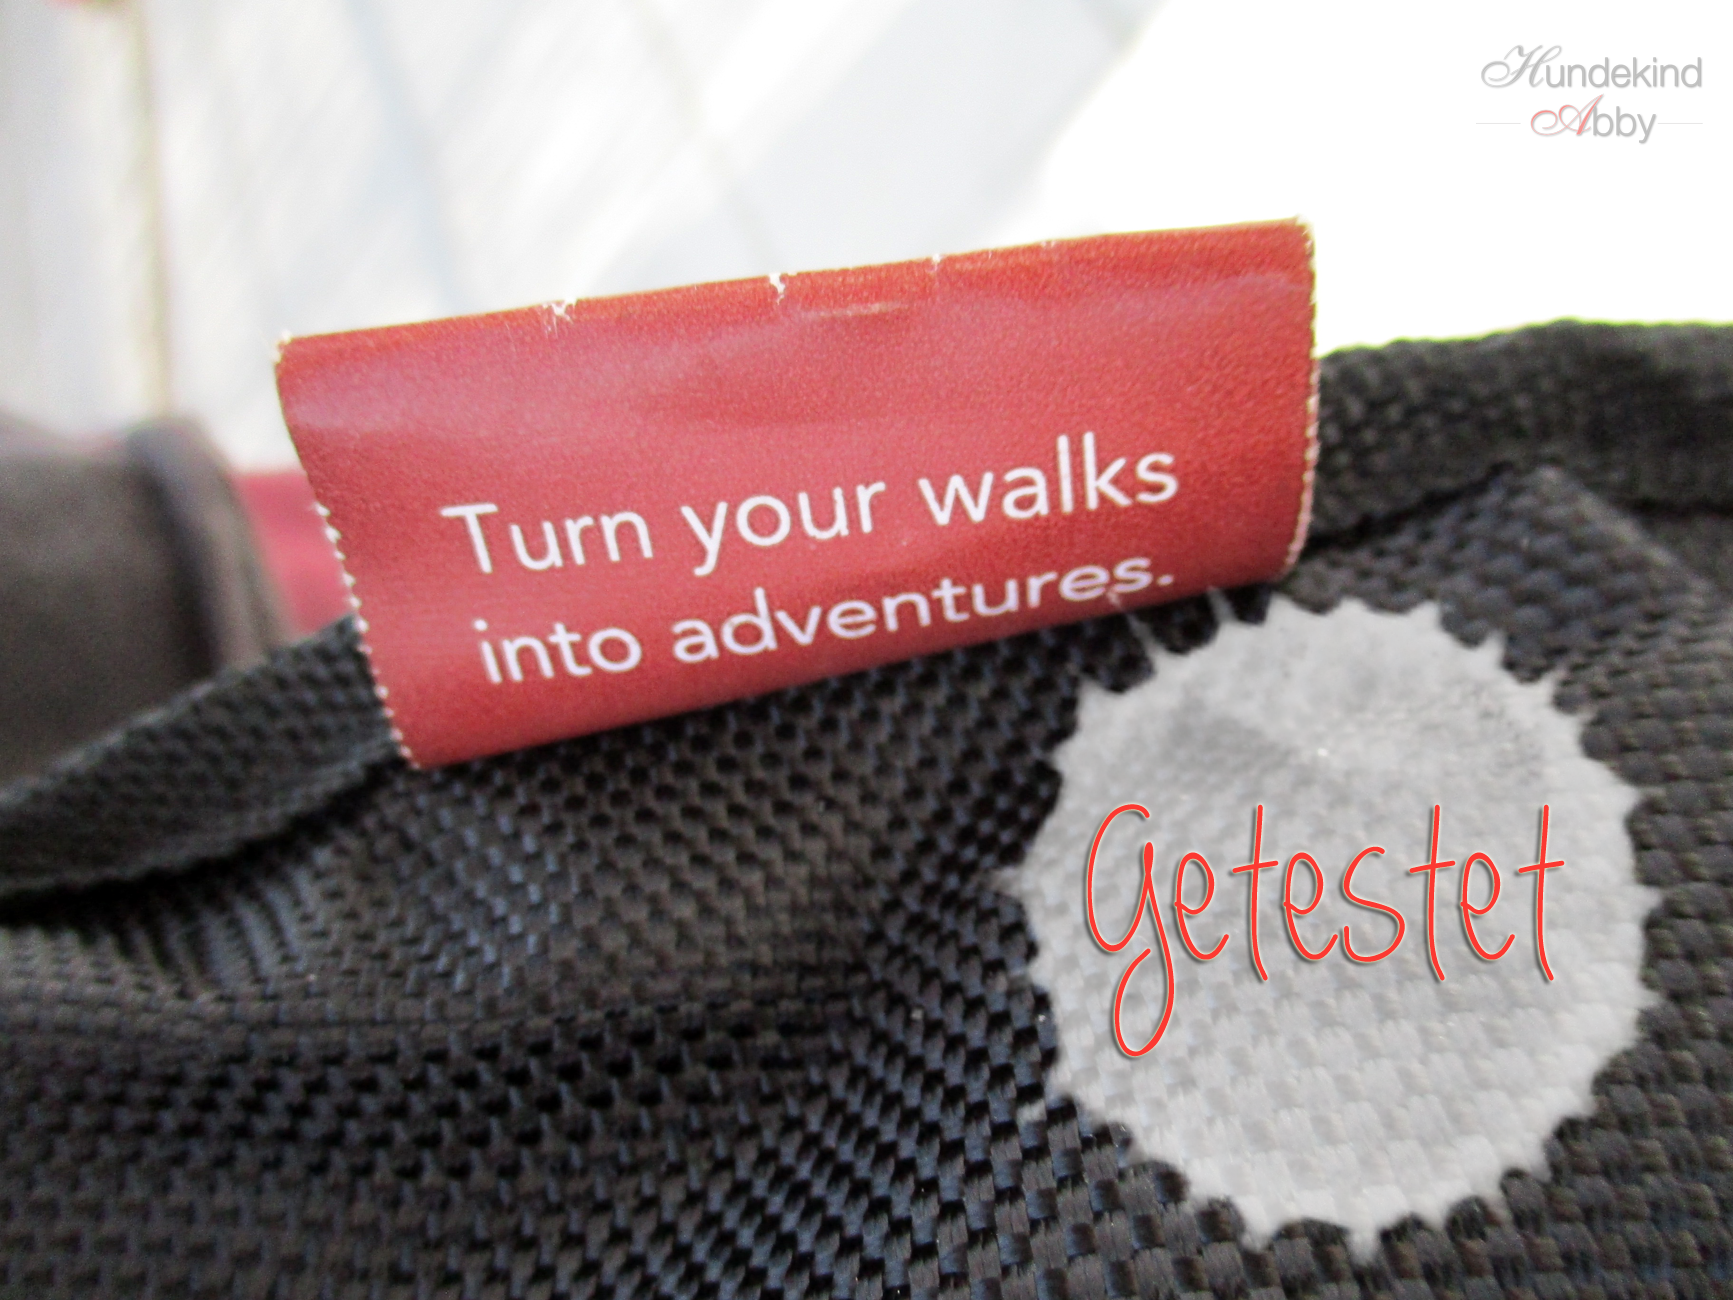 Getestet Adventurebag alcott